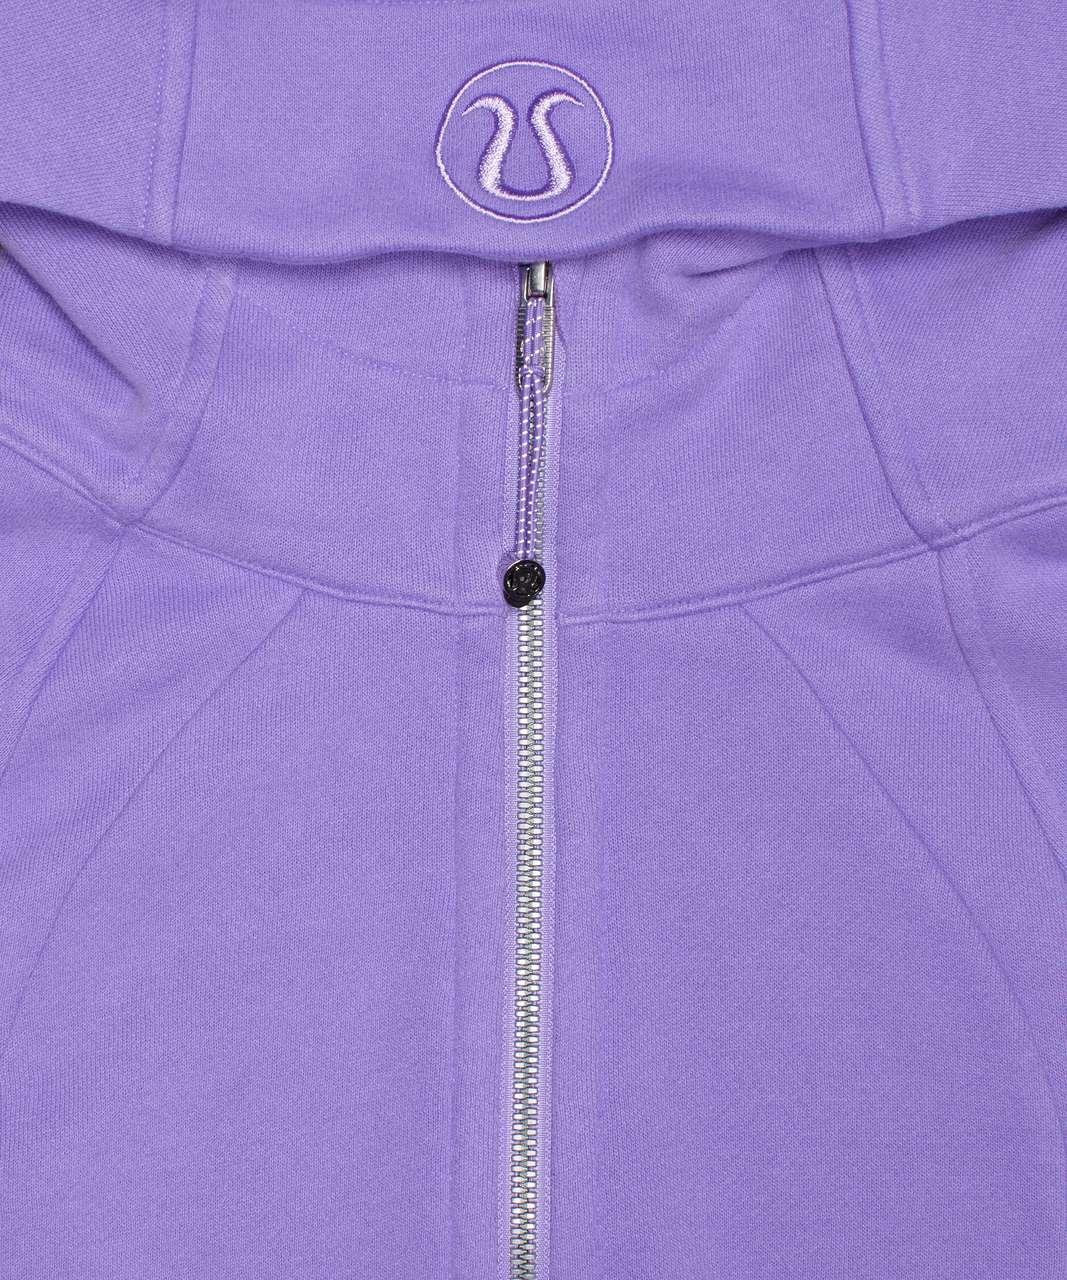 Lululemon Scuba Hoodie *Light Cotton Fleece - Mystic Iris